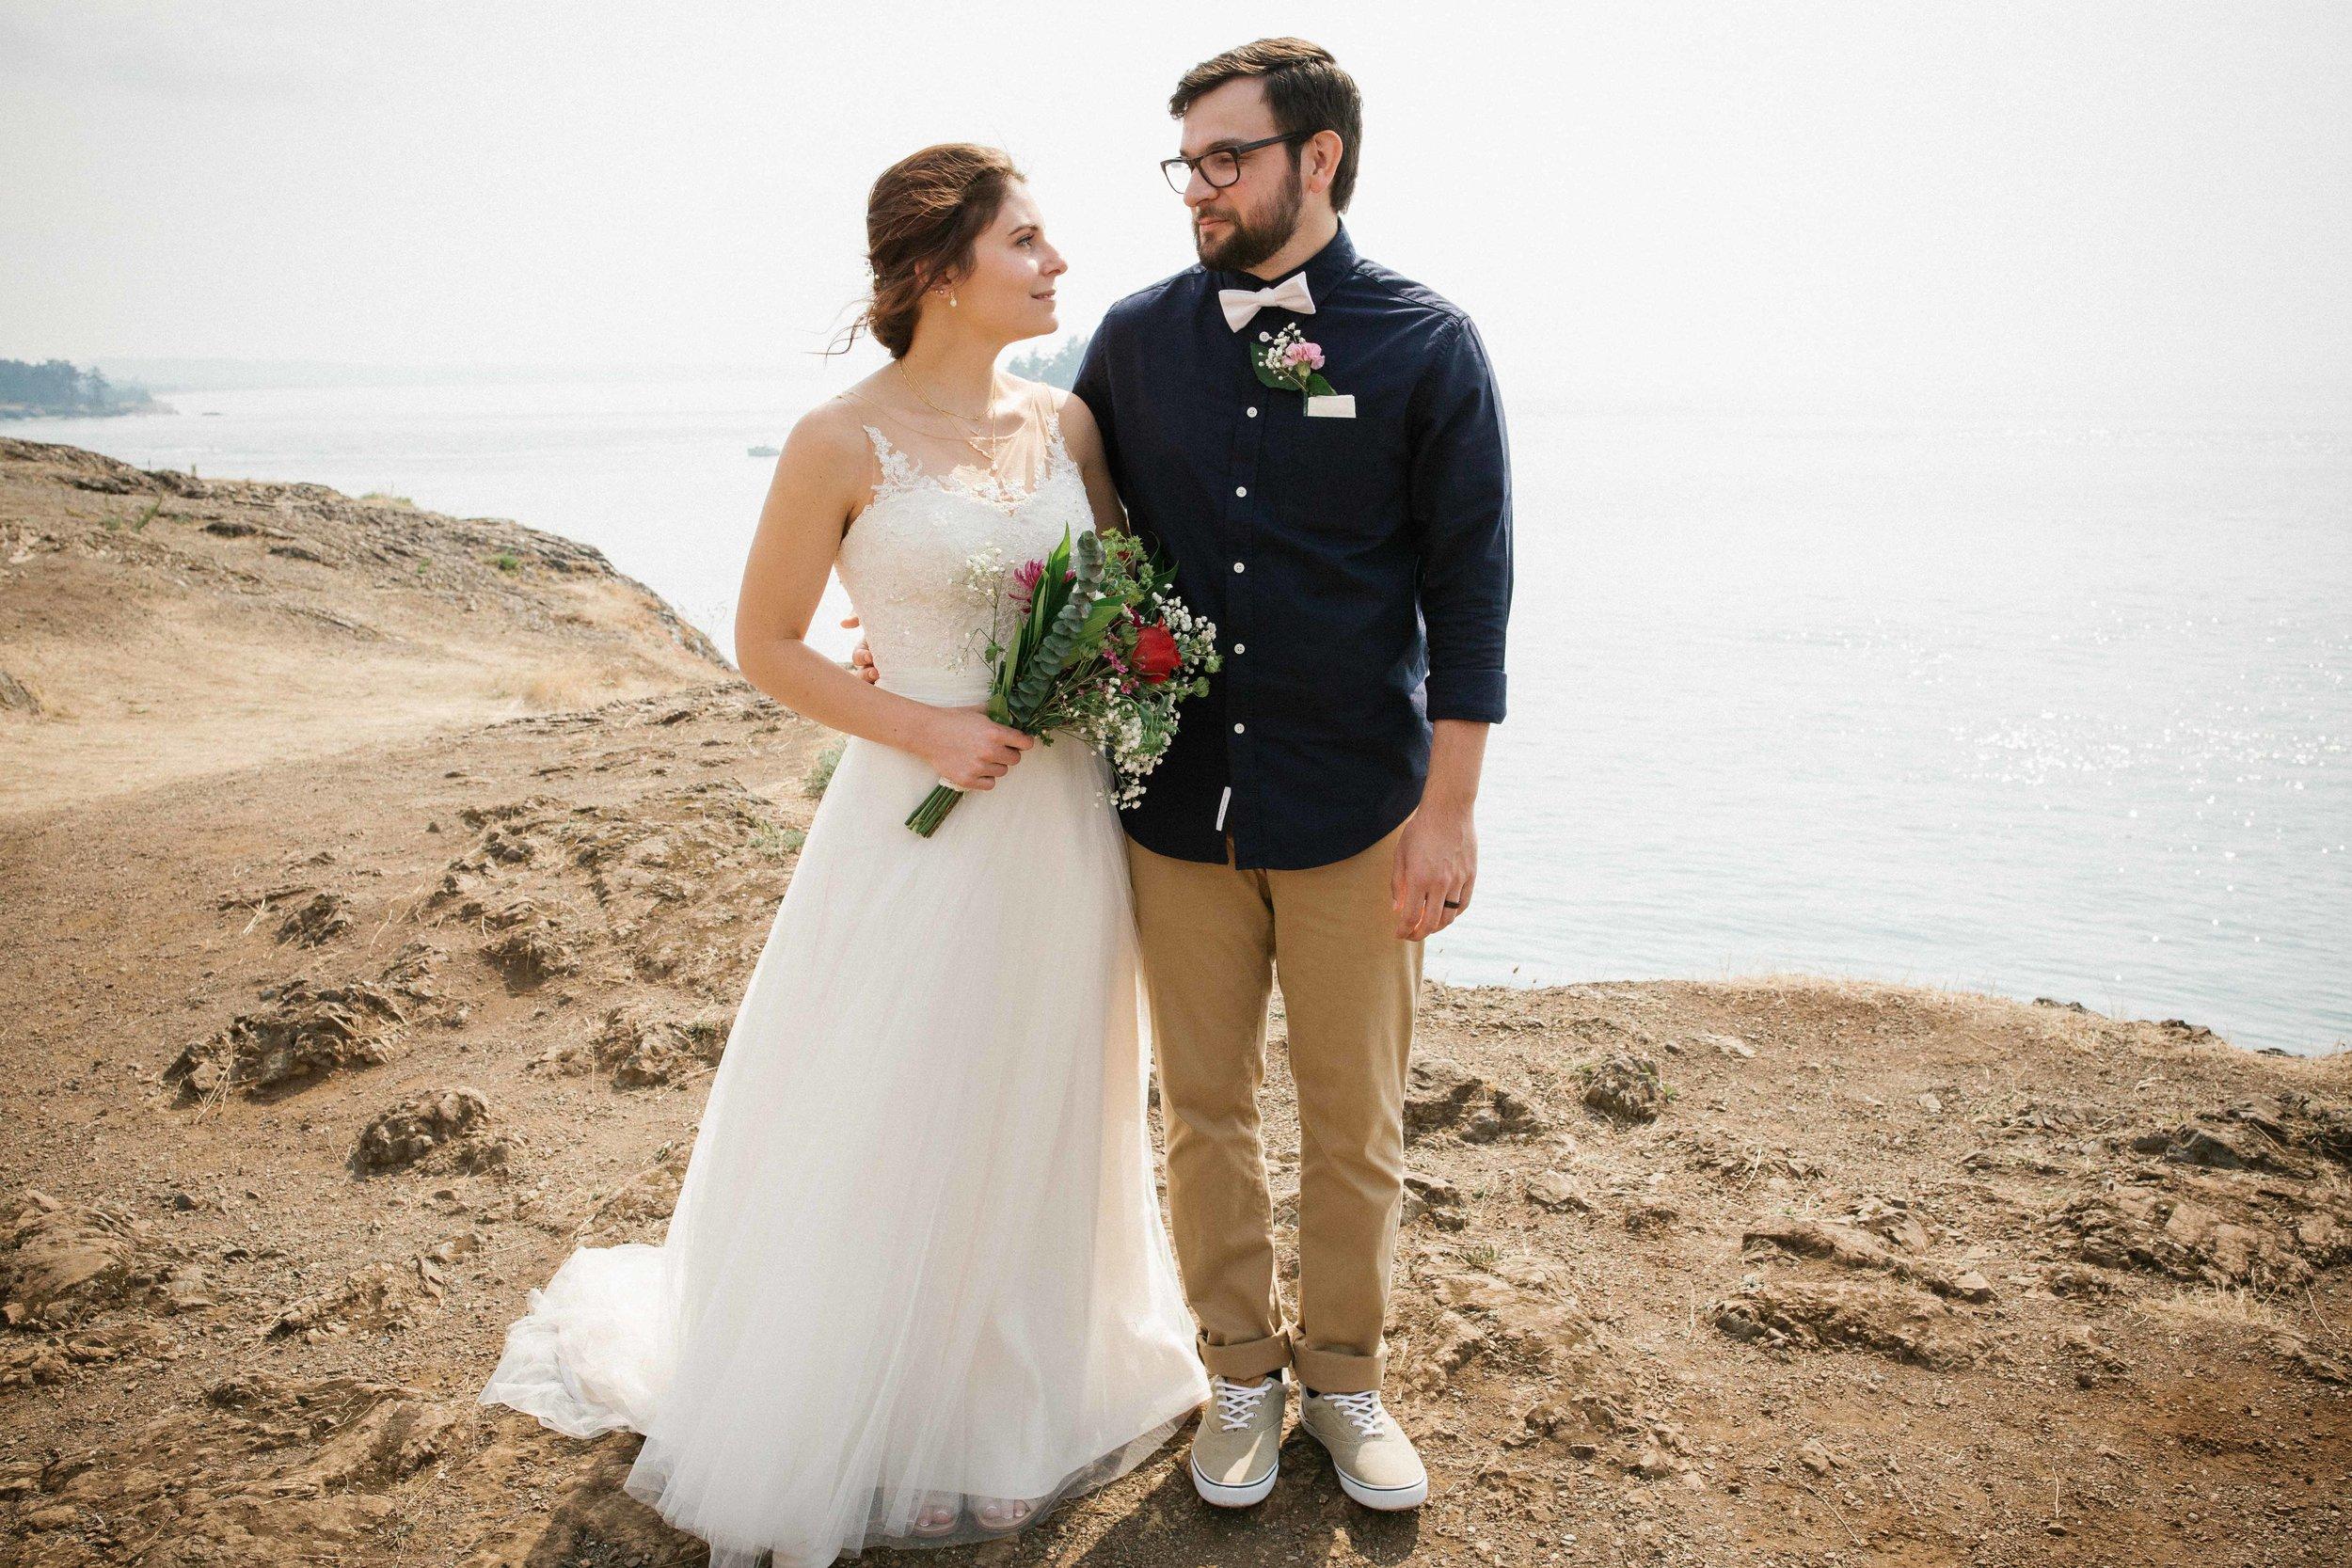 deception-pass-wedding-39.jpg